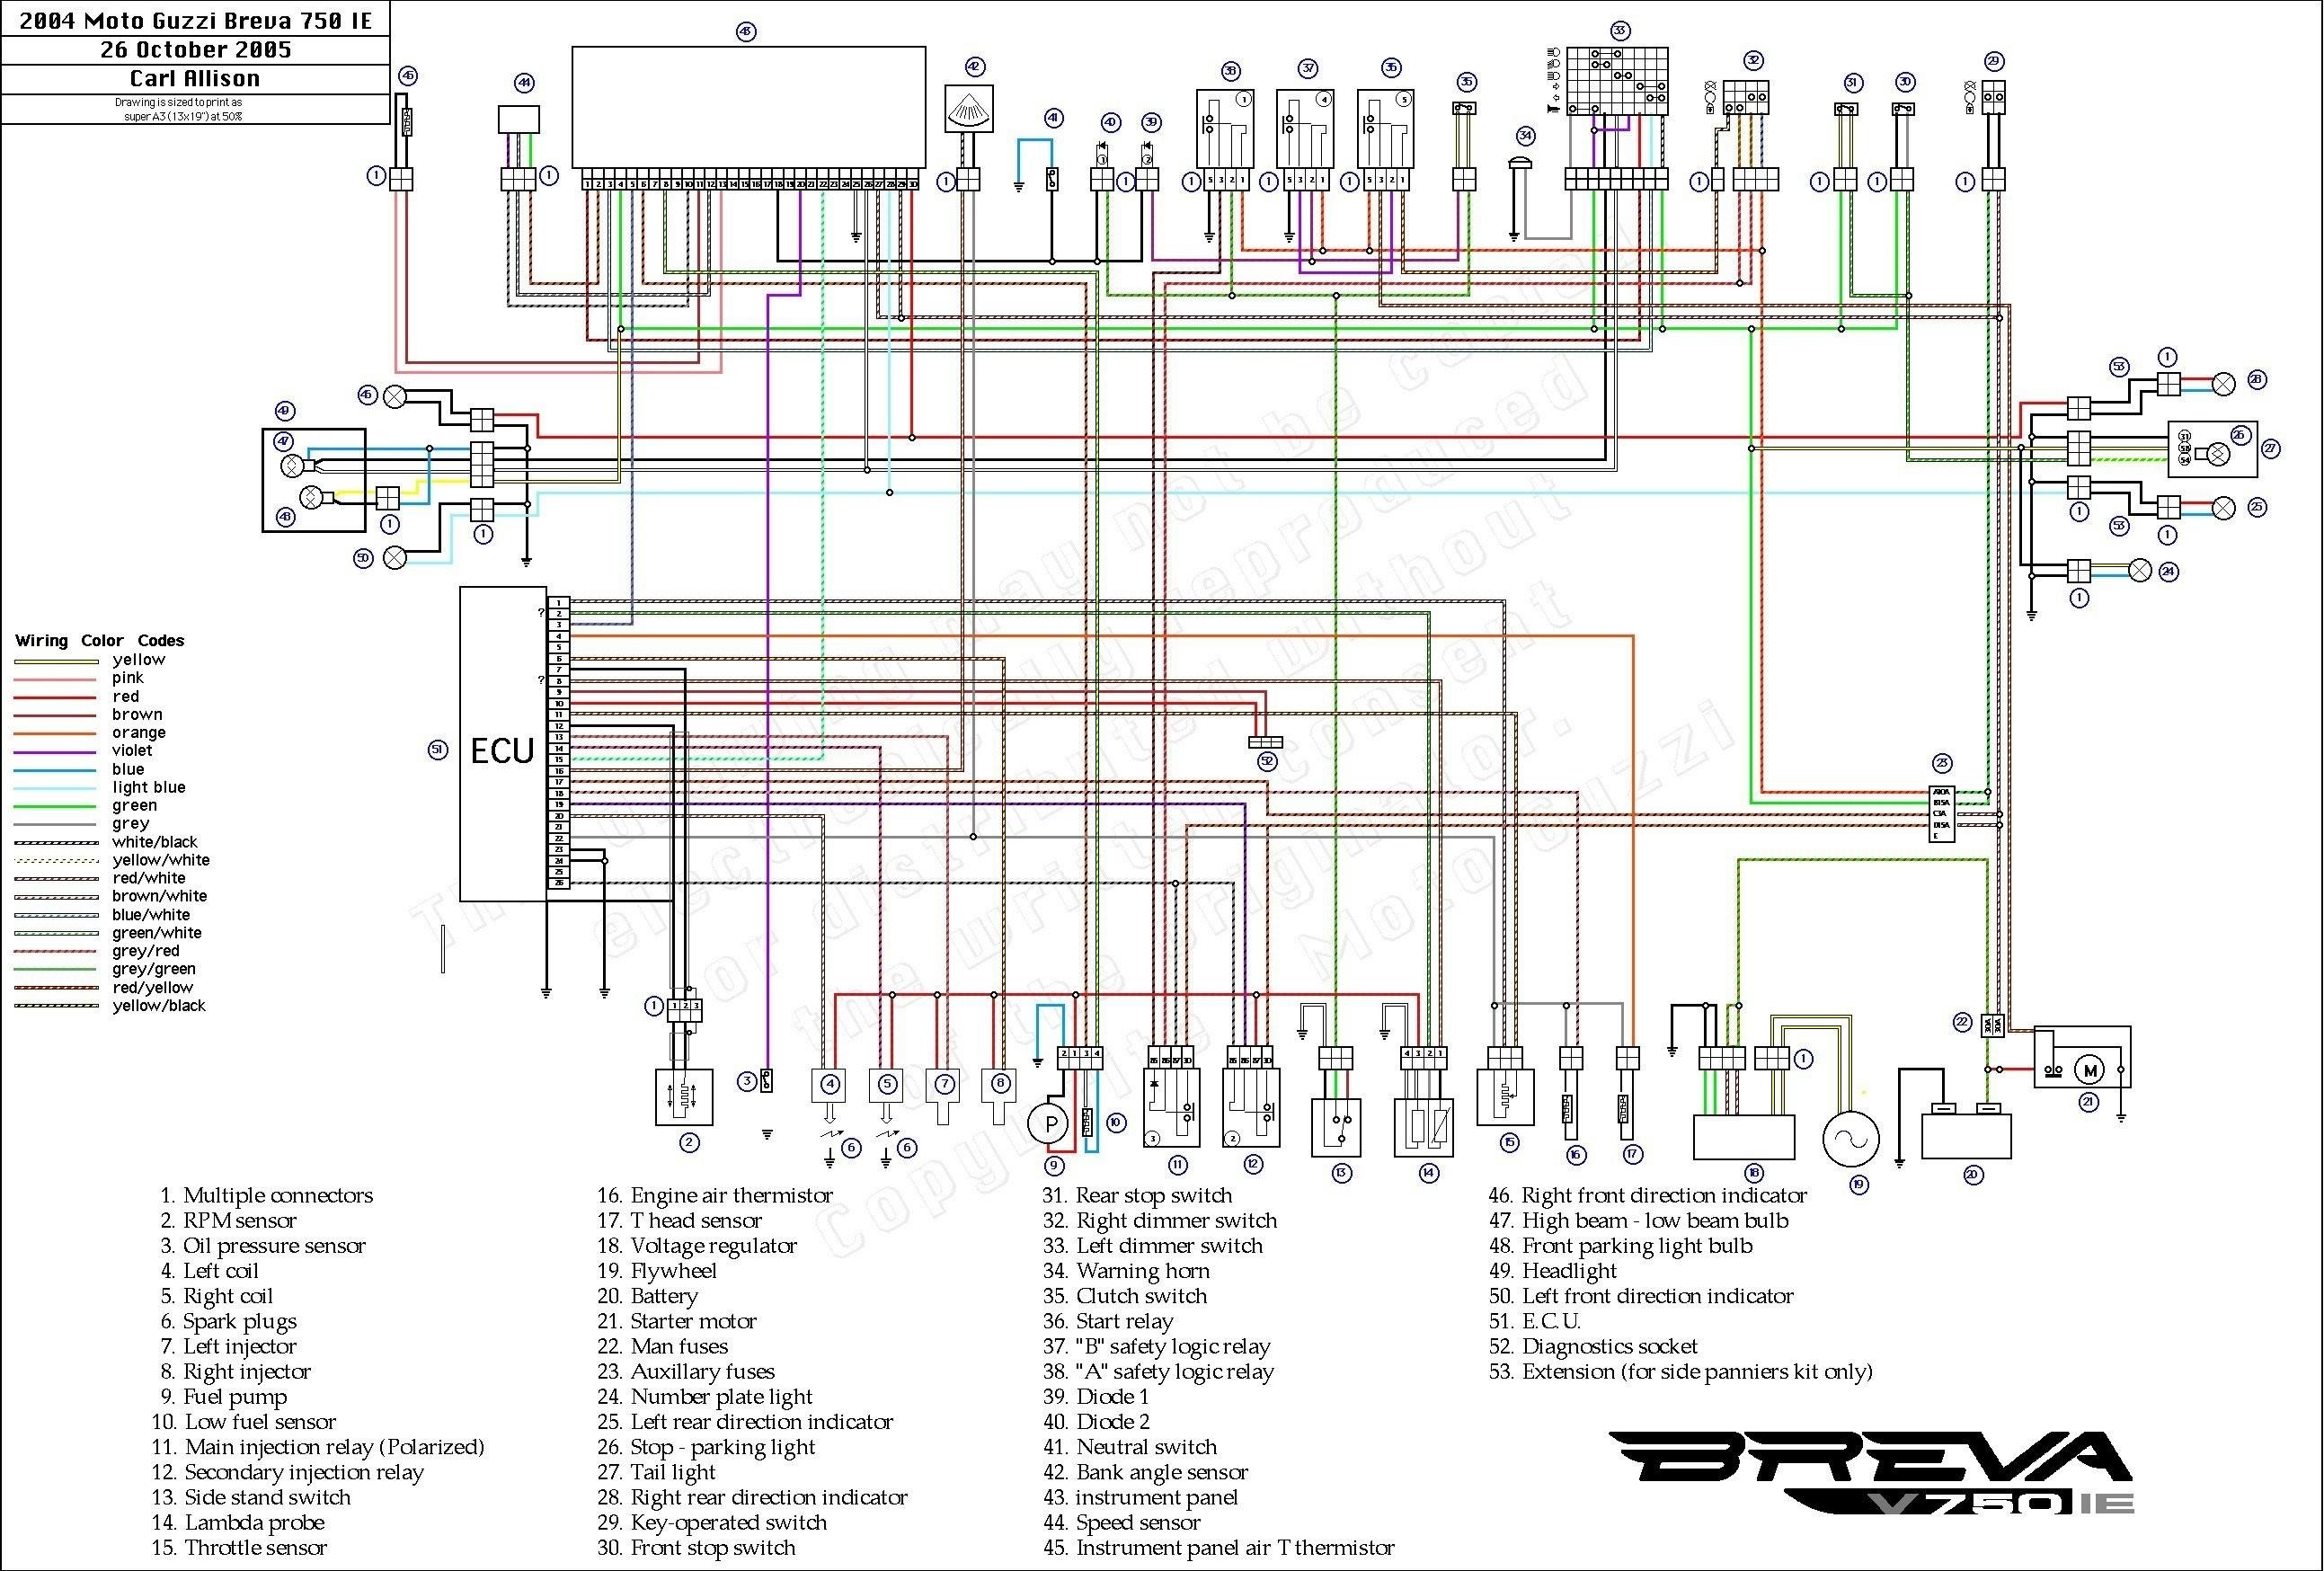 1999 Dodge Caravan Engine Diagram 2001 Dodge Durango Parts Diagram Start Building A Wiring Diagram • Of 1999 Dodge Caravan Engine Diagram